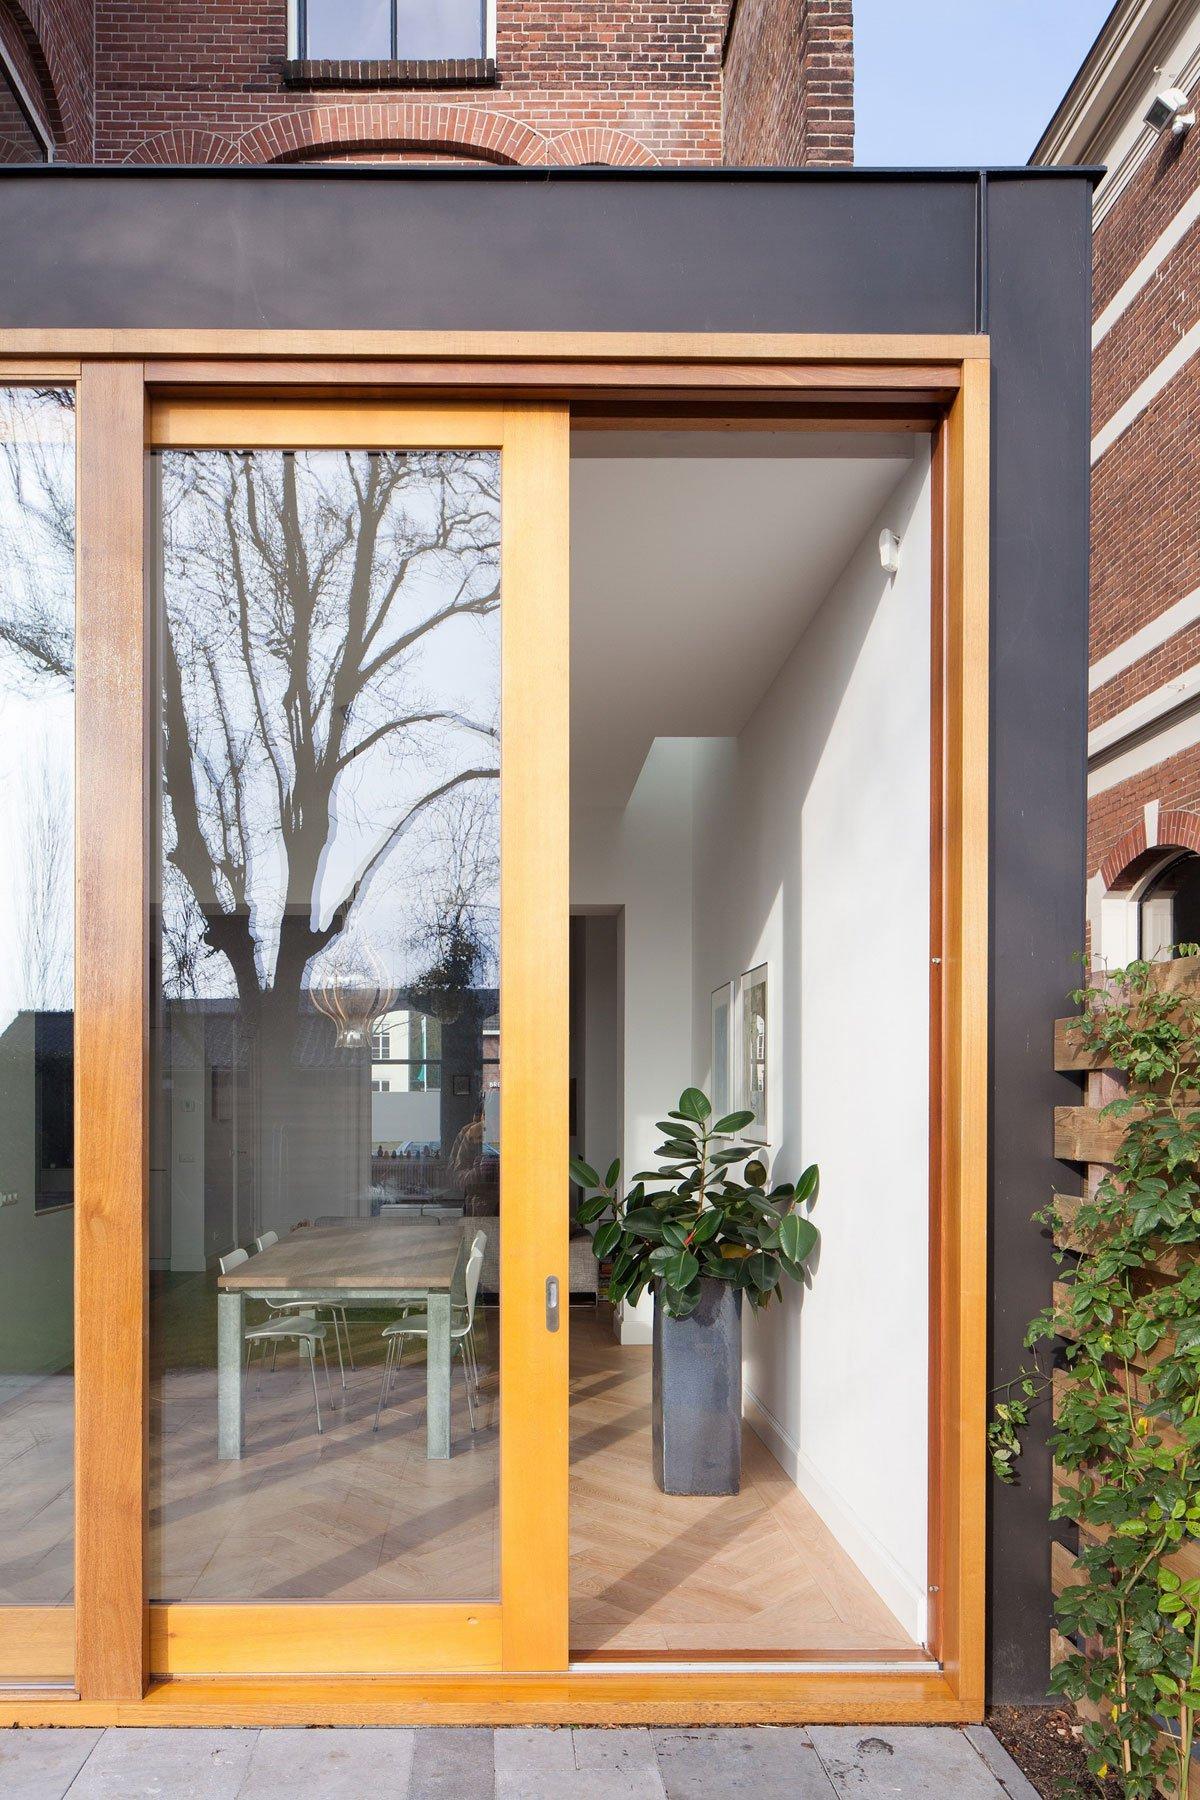 Extension-Maliebaan-Utrecht-03